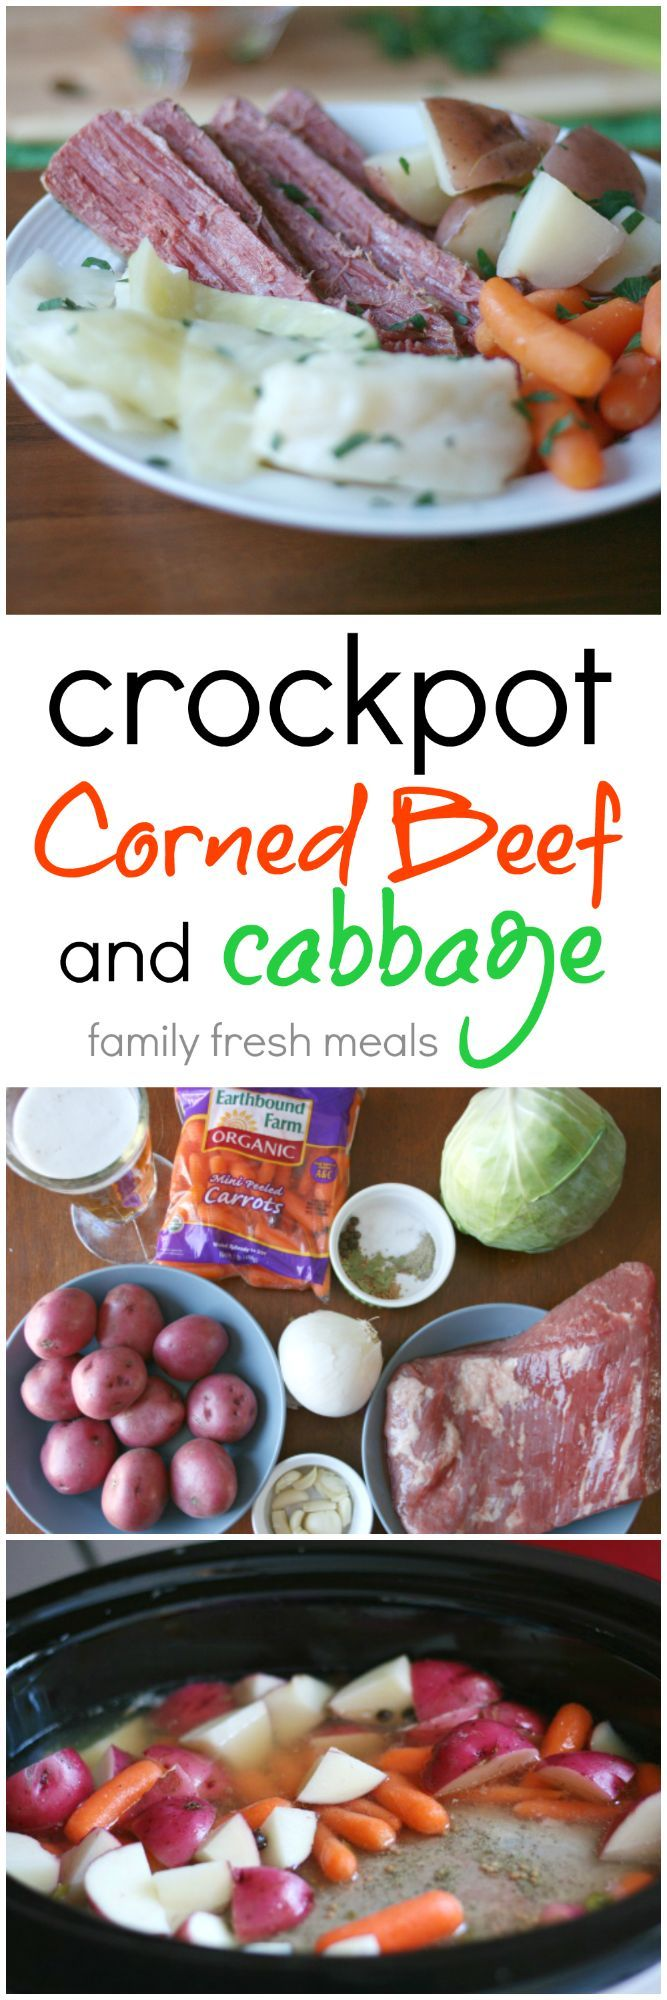 Crockpot Corned Beef and Cabbage Recipe - Never made corned beef and cabbage? Don't worry, this recipe is goof-proof! FamilyFreshMeals.com